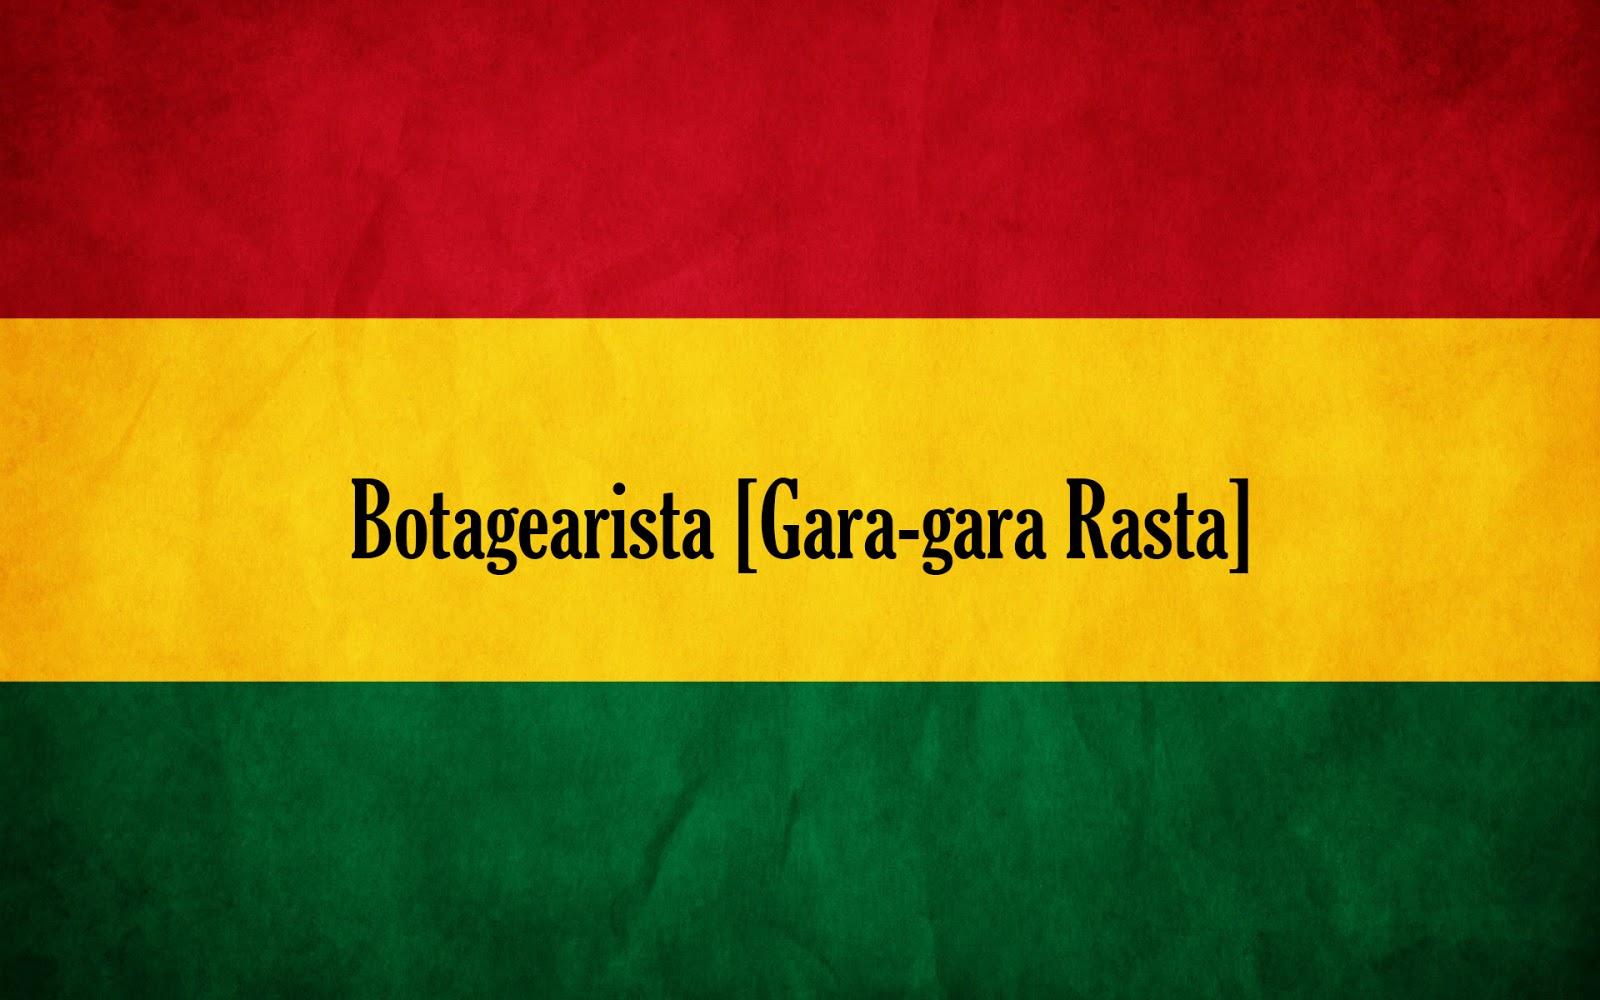 Chord Gitar Gara Gara Rasta